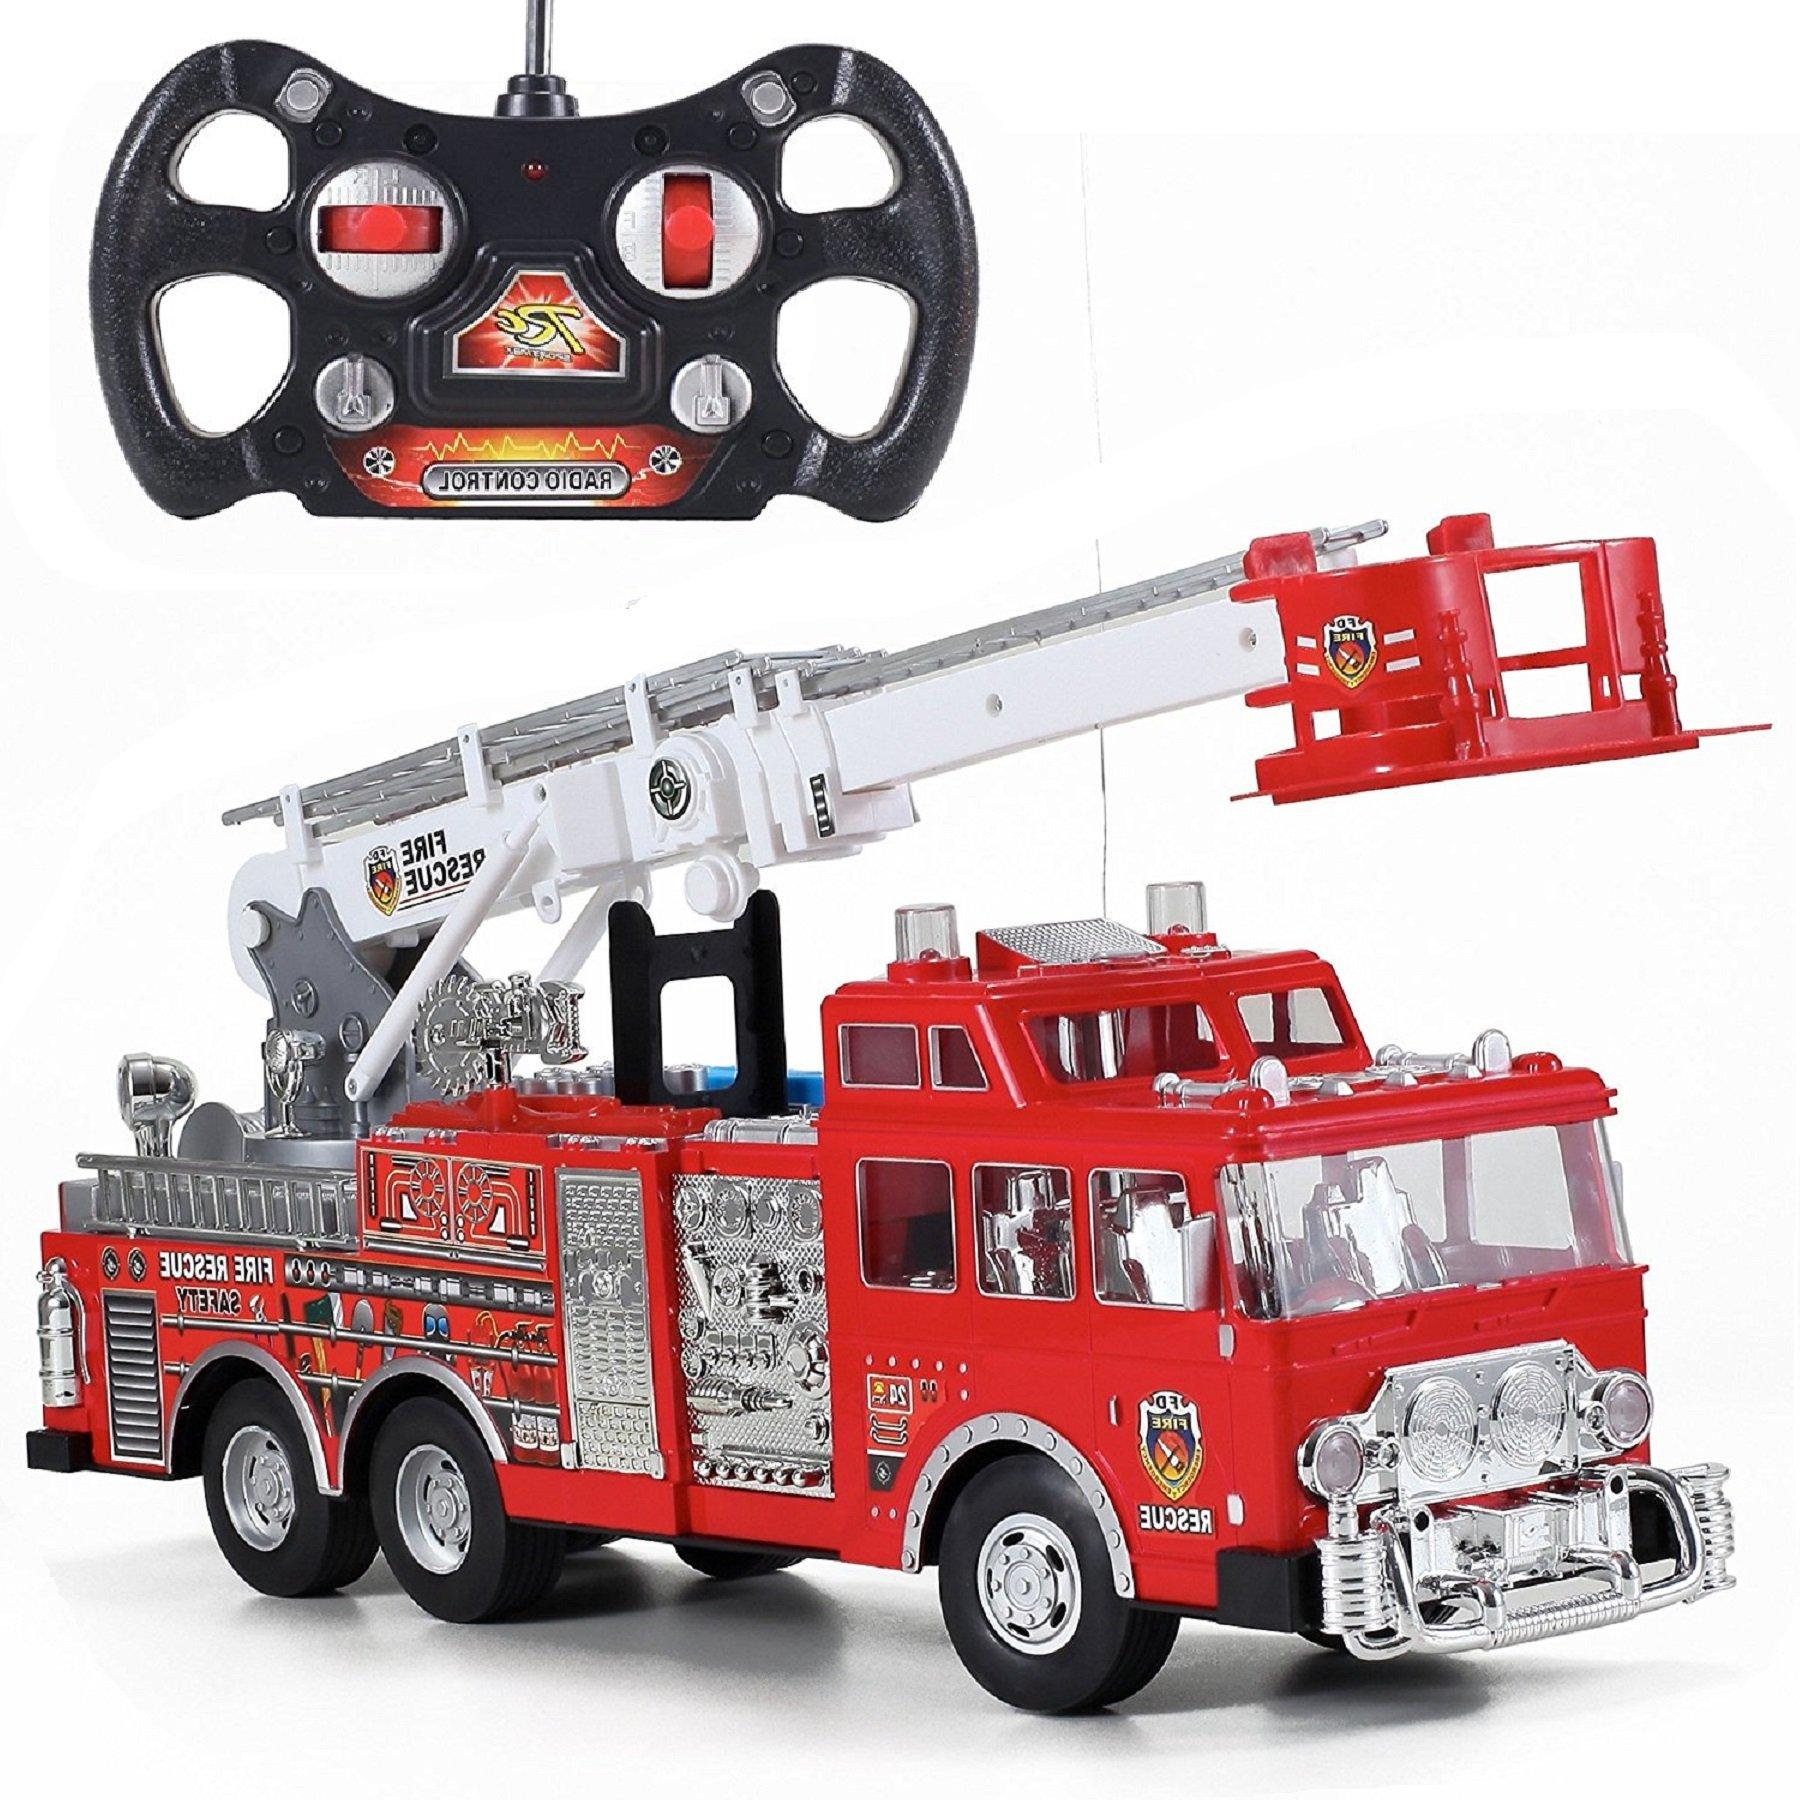 Prextex 13'' Rescue R/c Fire Engine Truck Remote Control Fire Truck Best Gift Toy Boys Lights Siren Extending Ladder